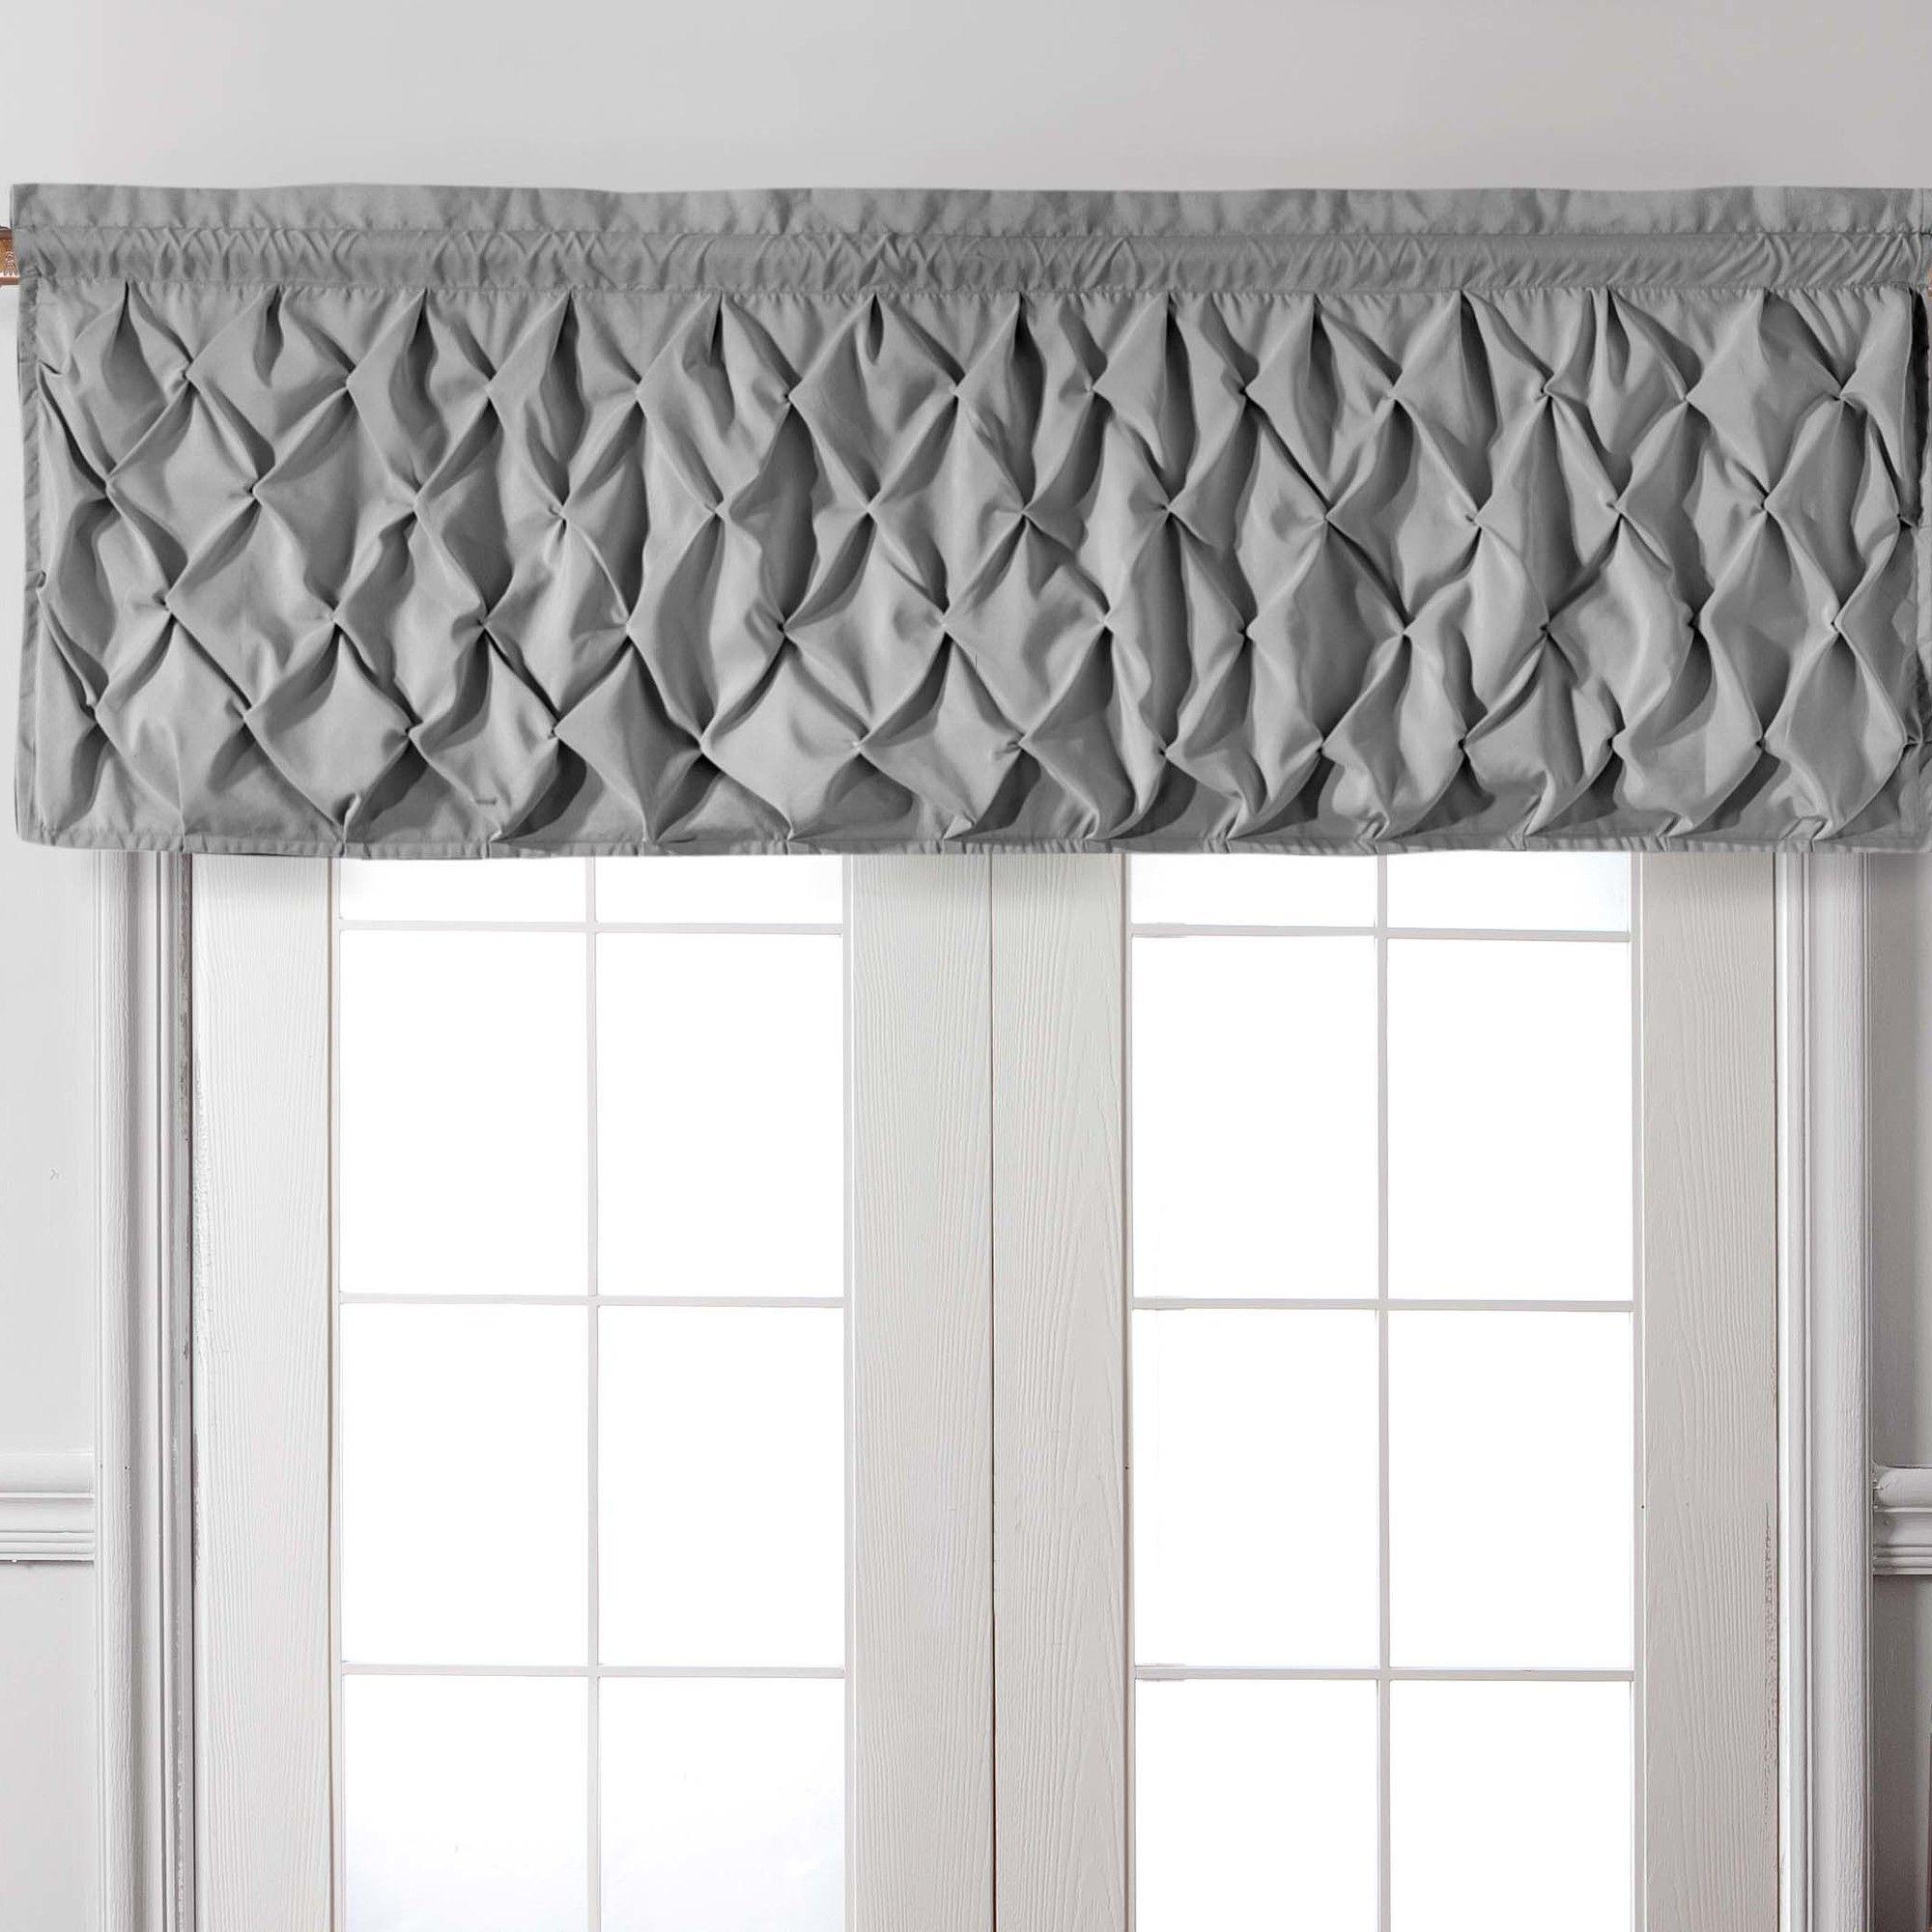 Curtain valances for windows and rods - Taryn Pintucked Rod Pocket Curtain Valance